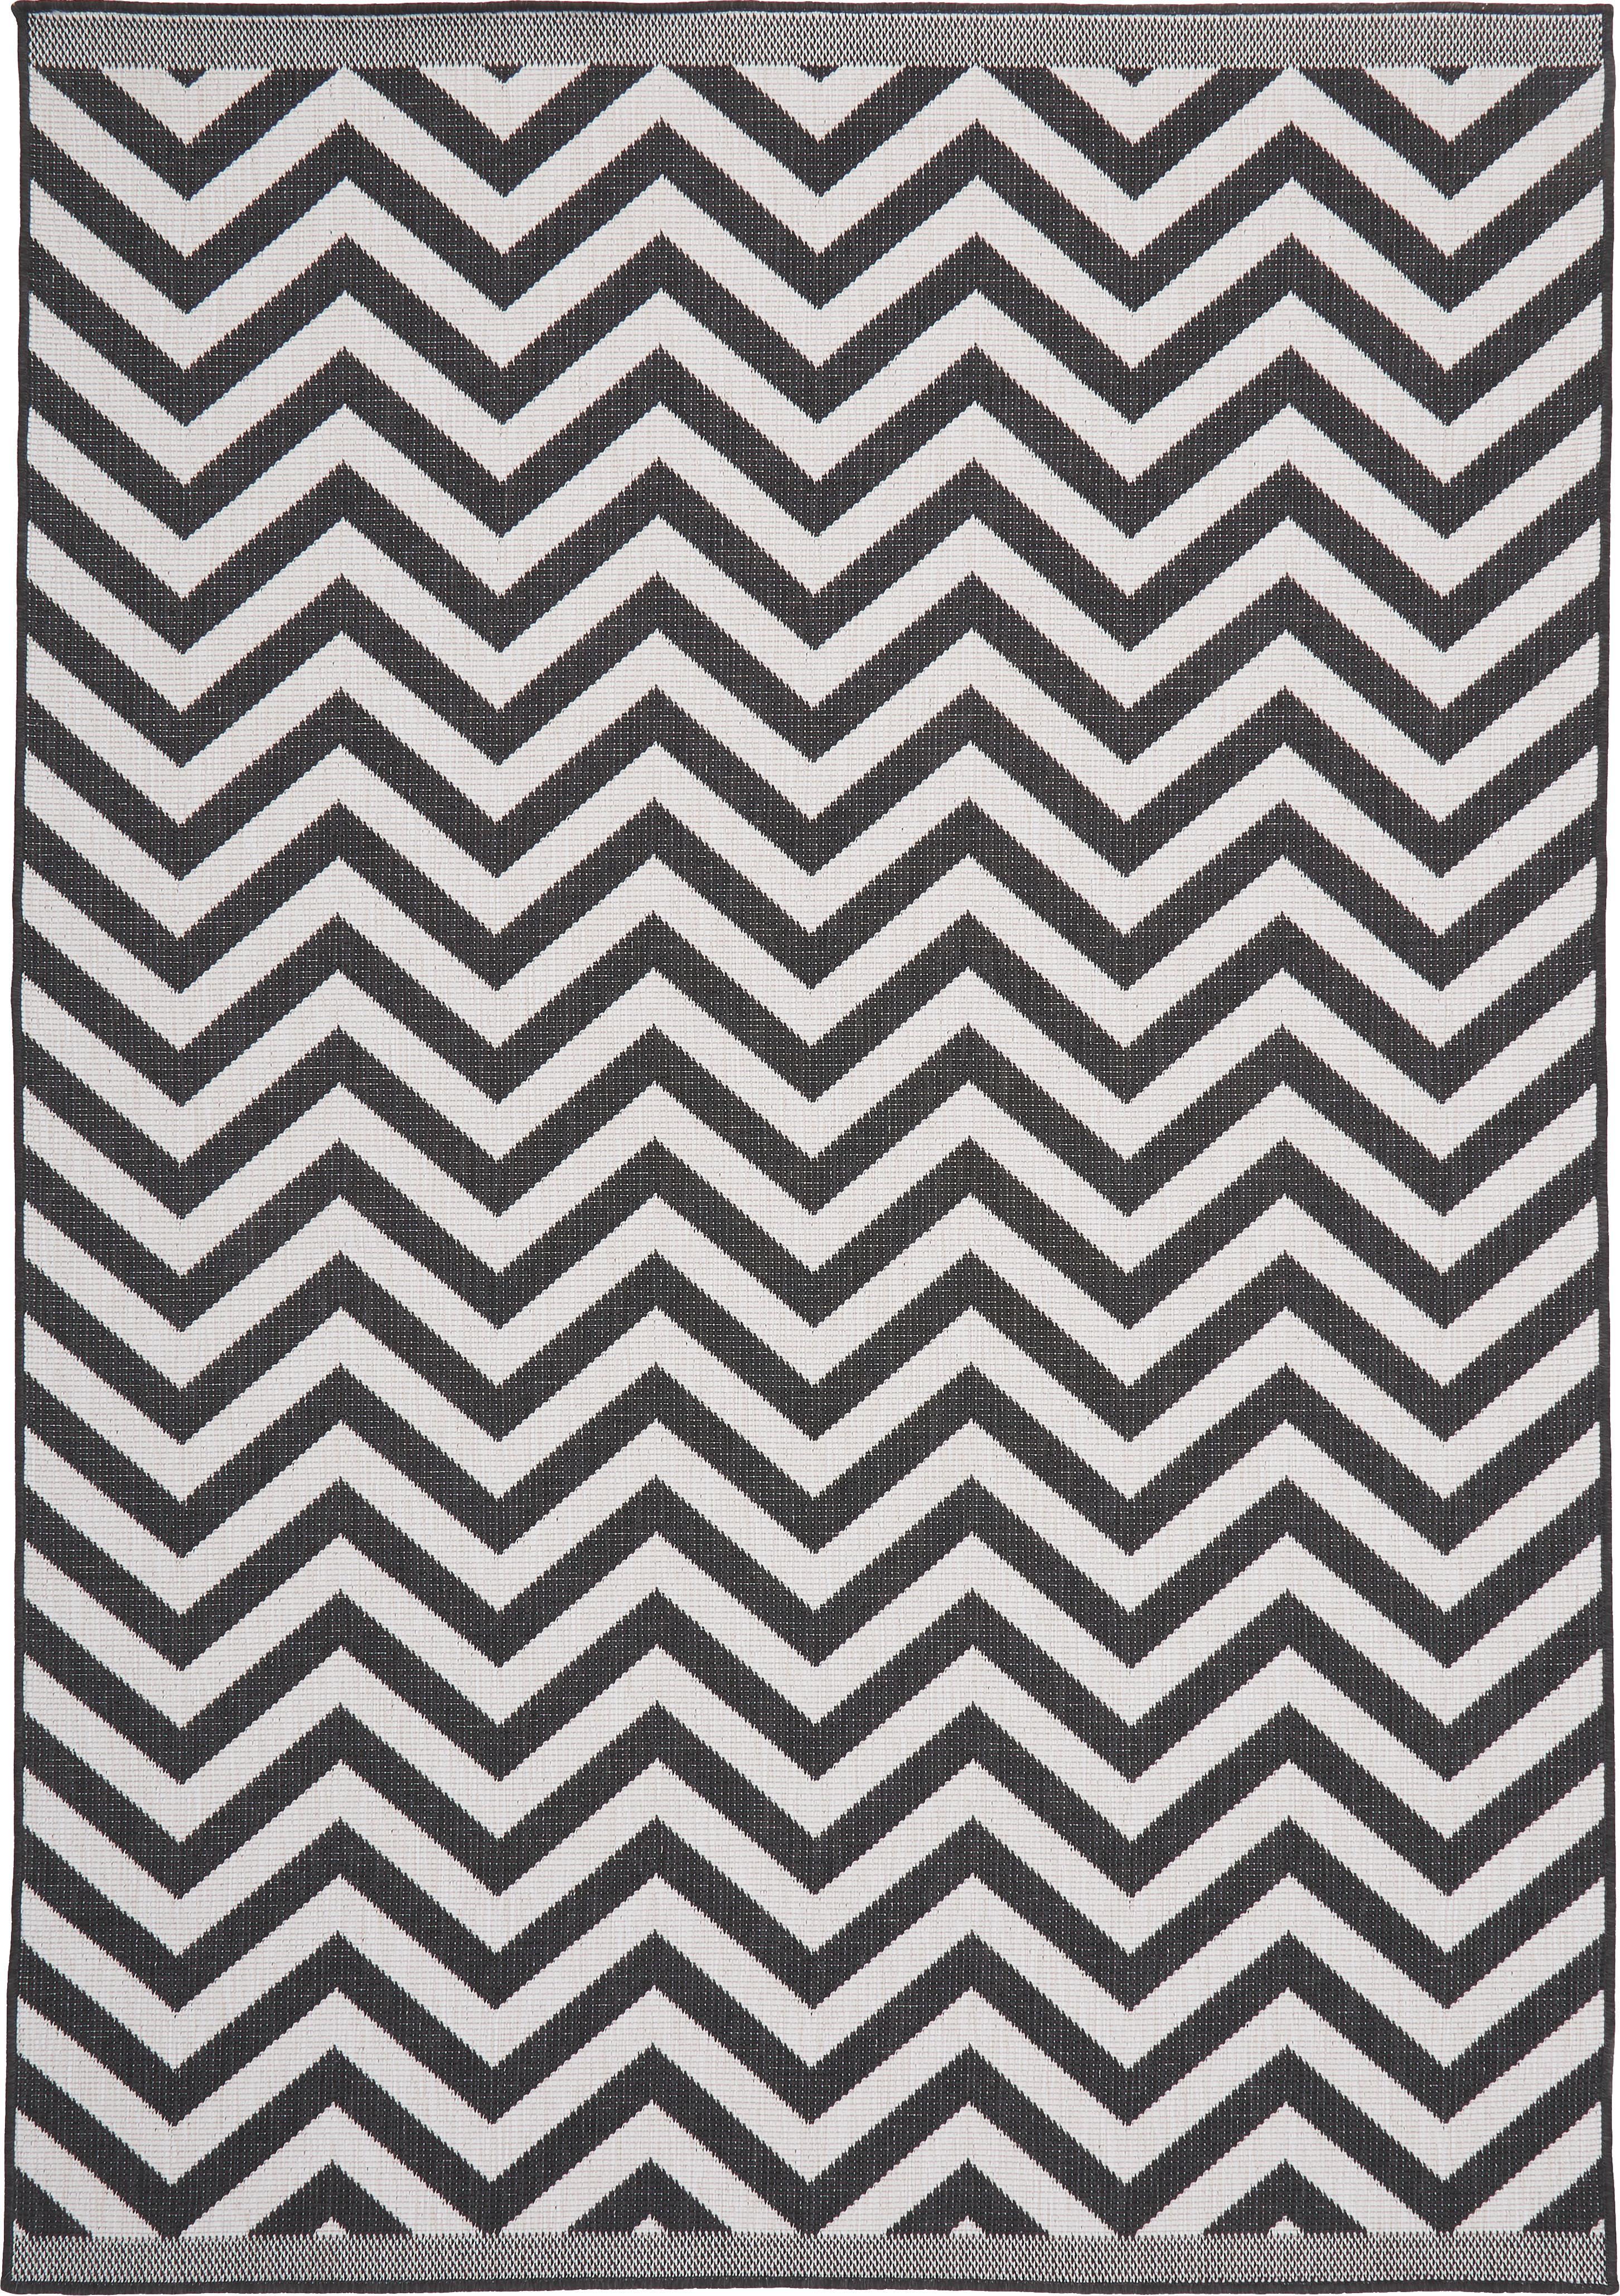 Alfombra reversible de interior/exterior Palma, Negro, crema, An 160 x L 230 cm (Tamaño M)